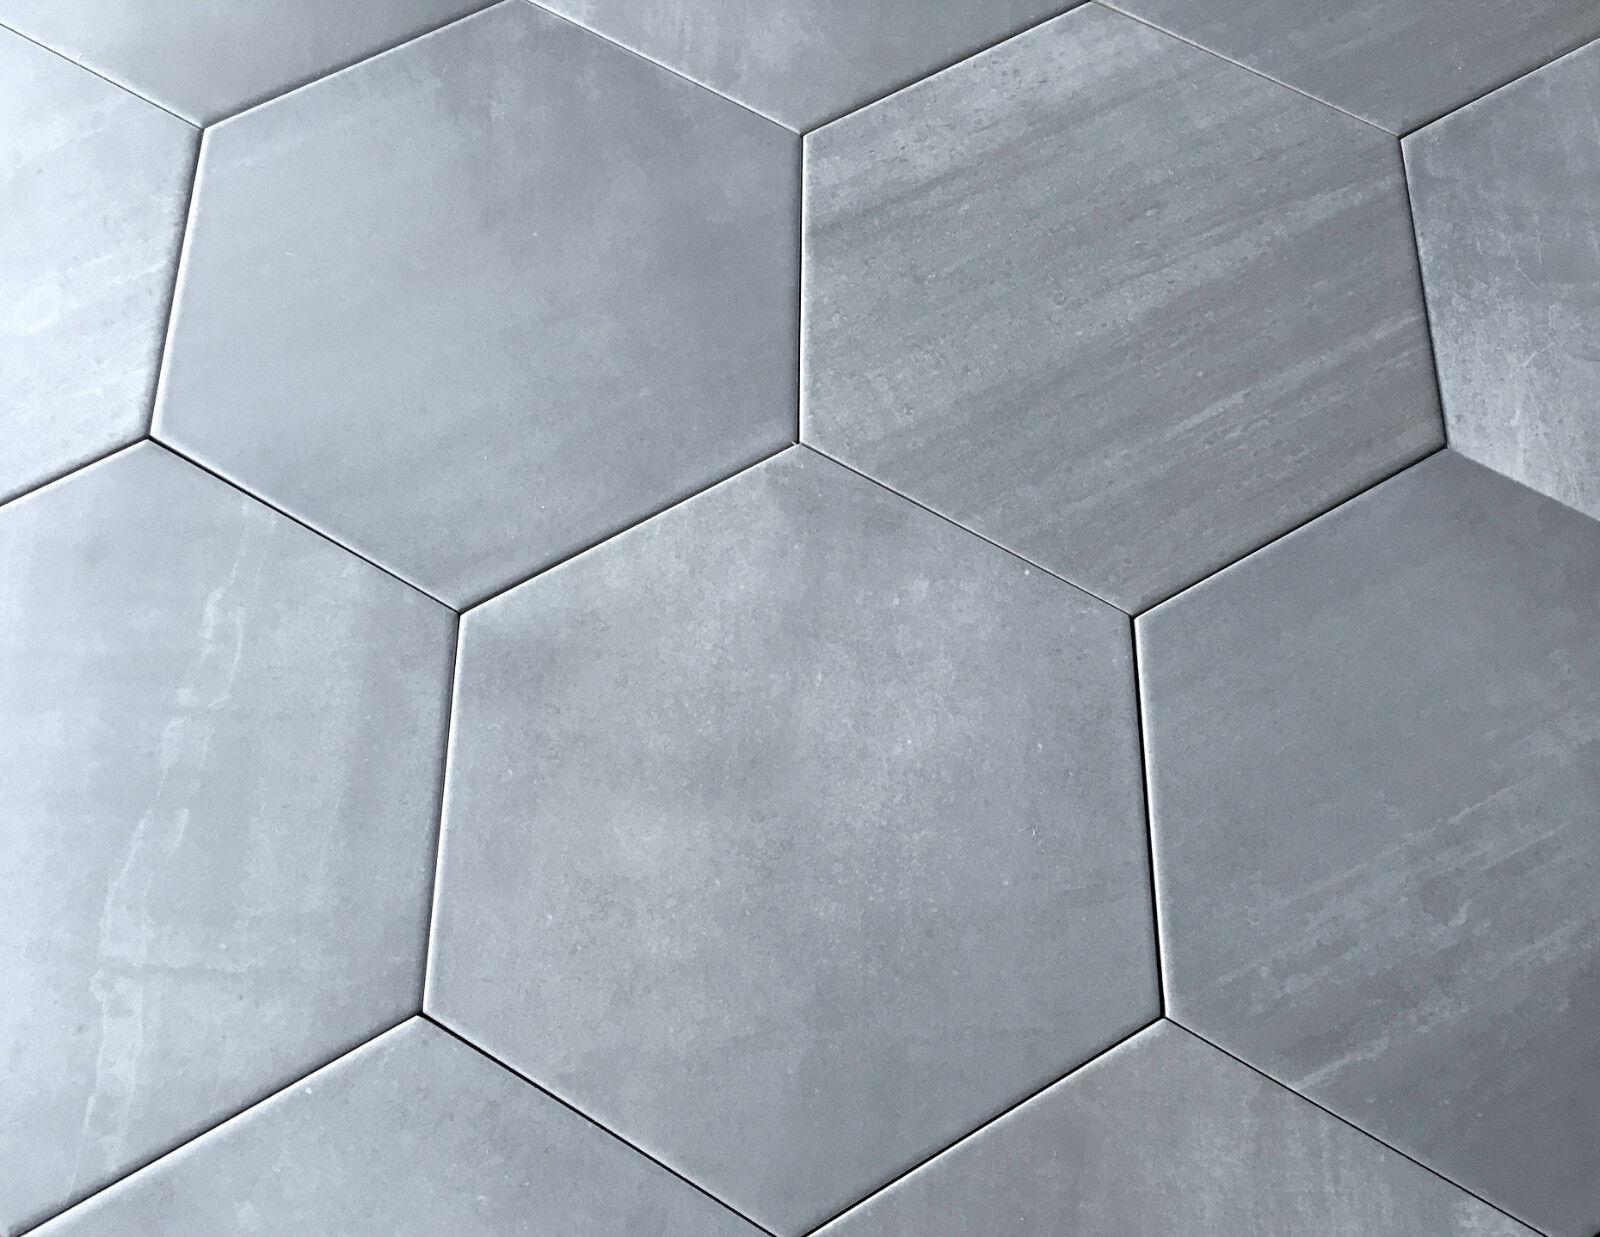 10.2 x11.4 Gray Hexagon Gris Porcelain Tile Floor and Wall